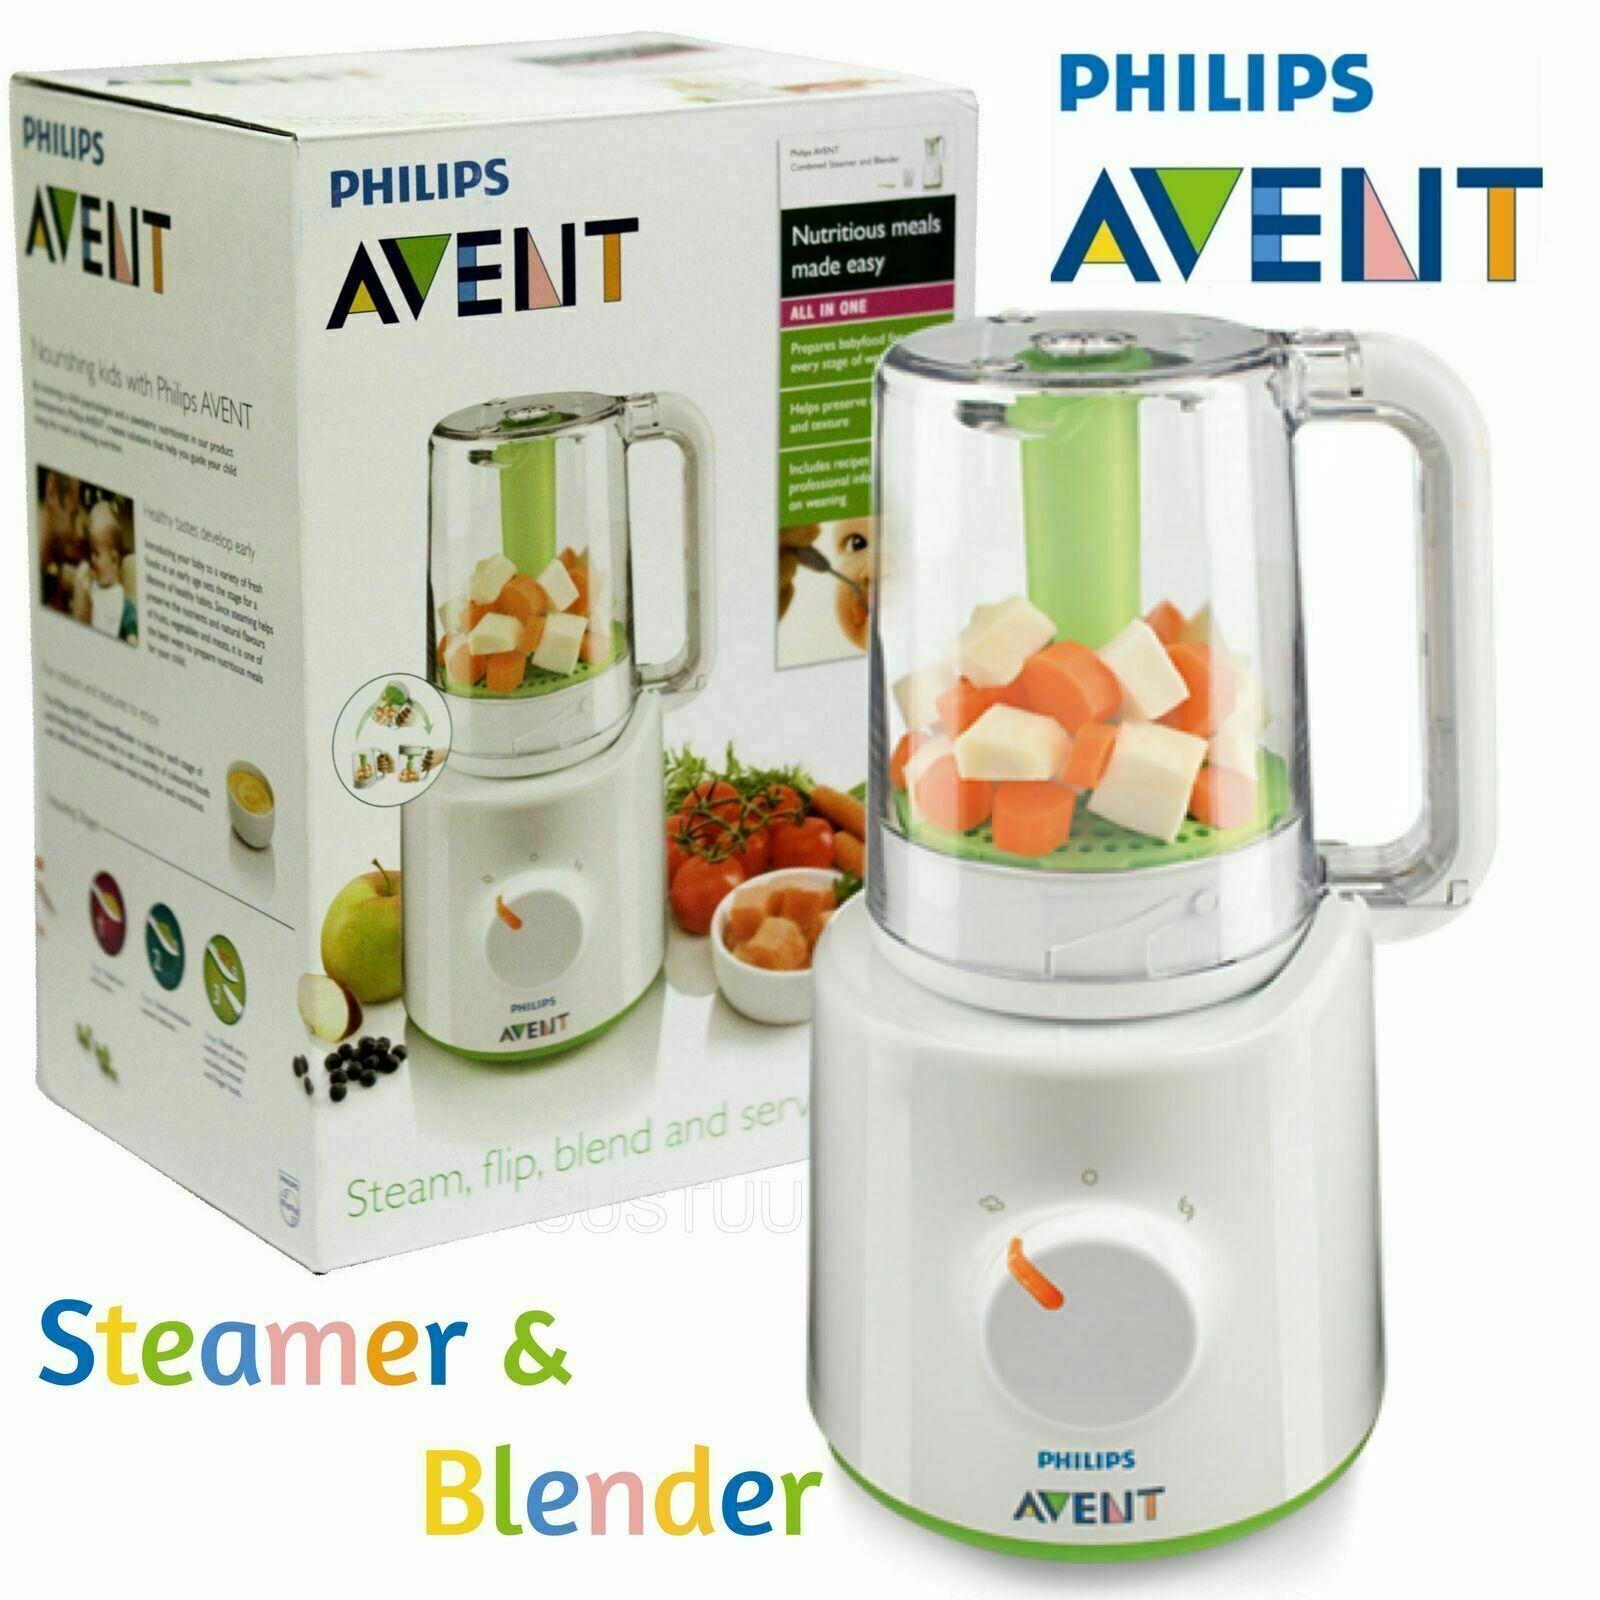 Philips Avent Scf870 22 Wasabi Bpa Free Healthy Baby Food Juice Soup Maker Steamer Blender For Food To Nursery Baby 220v Blenders Aliexpress